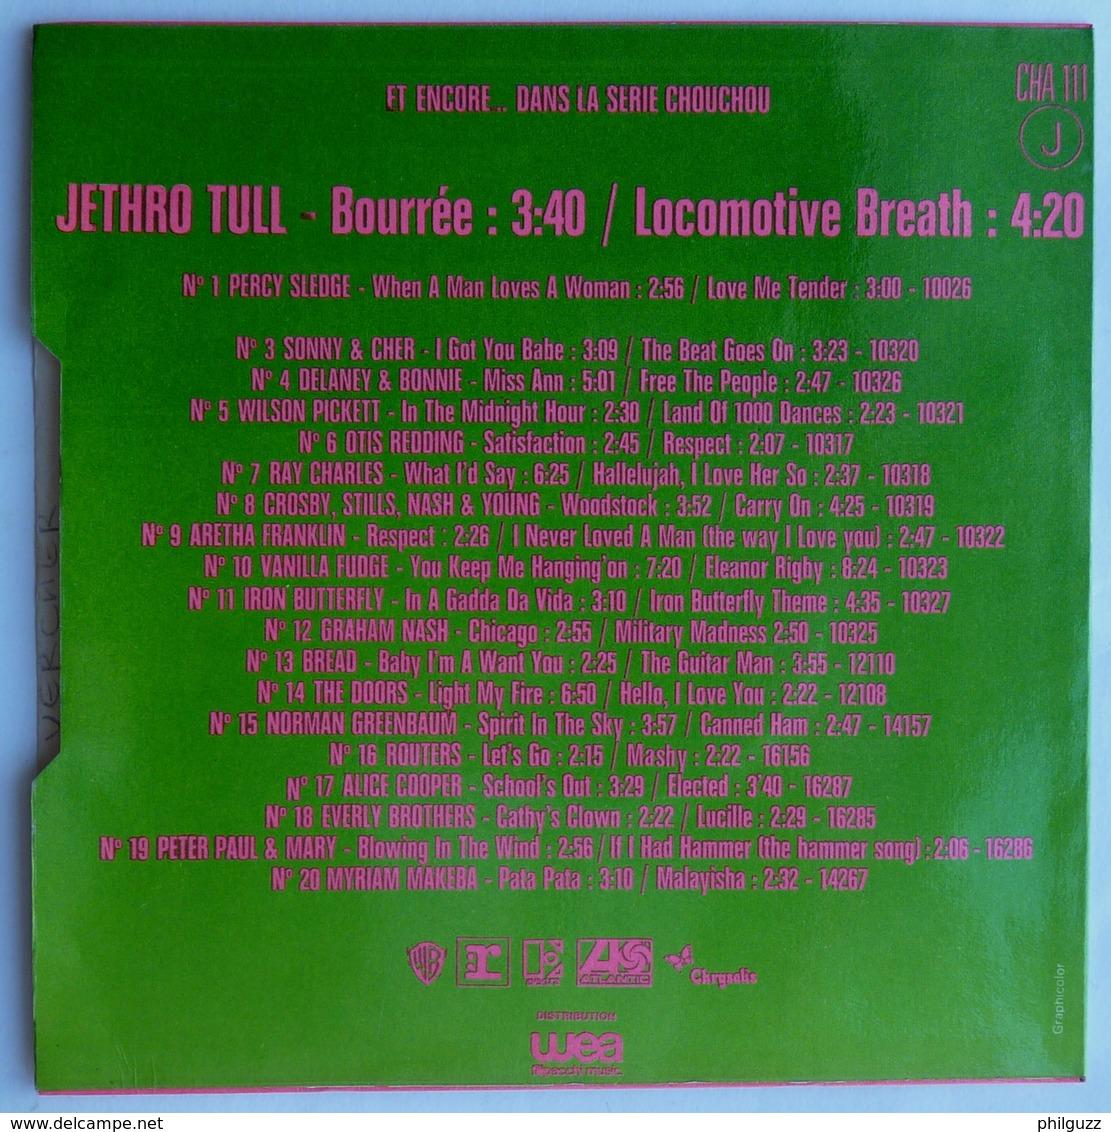 DISQUE 45T JETHRO TULL BOUREE LOCOMOTIVE BREATH  Série Chouchou  Cha 111 - Rock